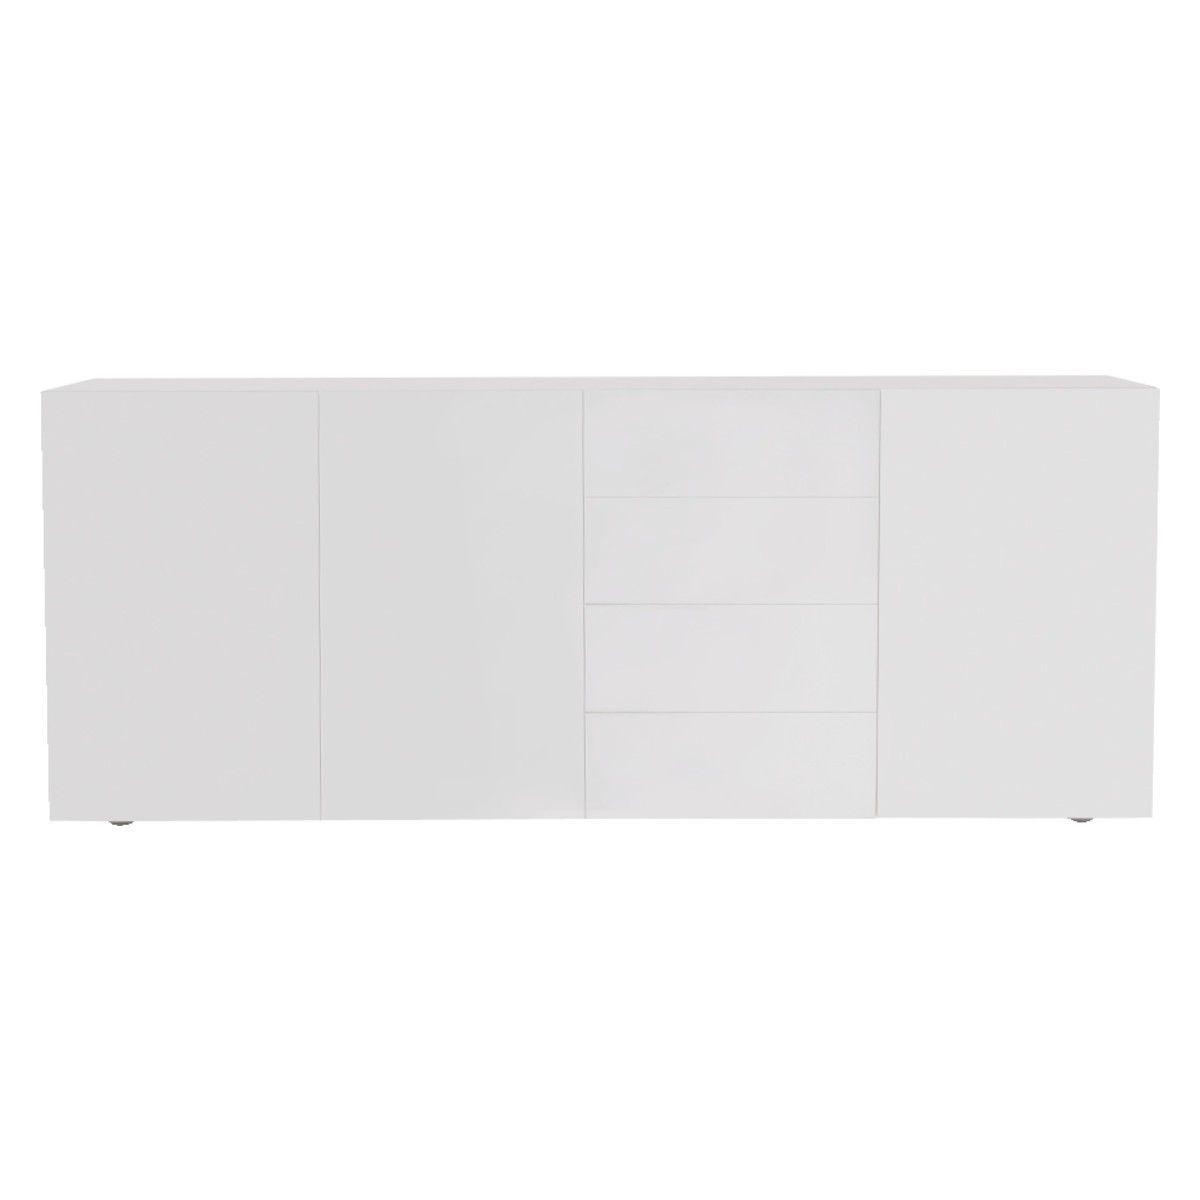 ASPEN White high gloss sideboard | High gloss, Aspen and Gray interior